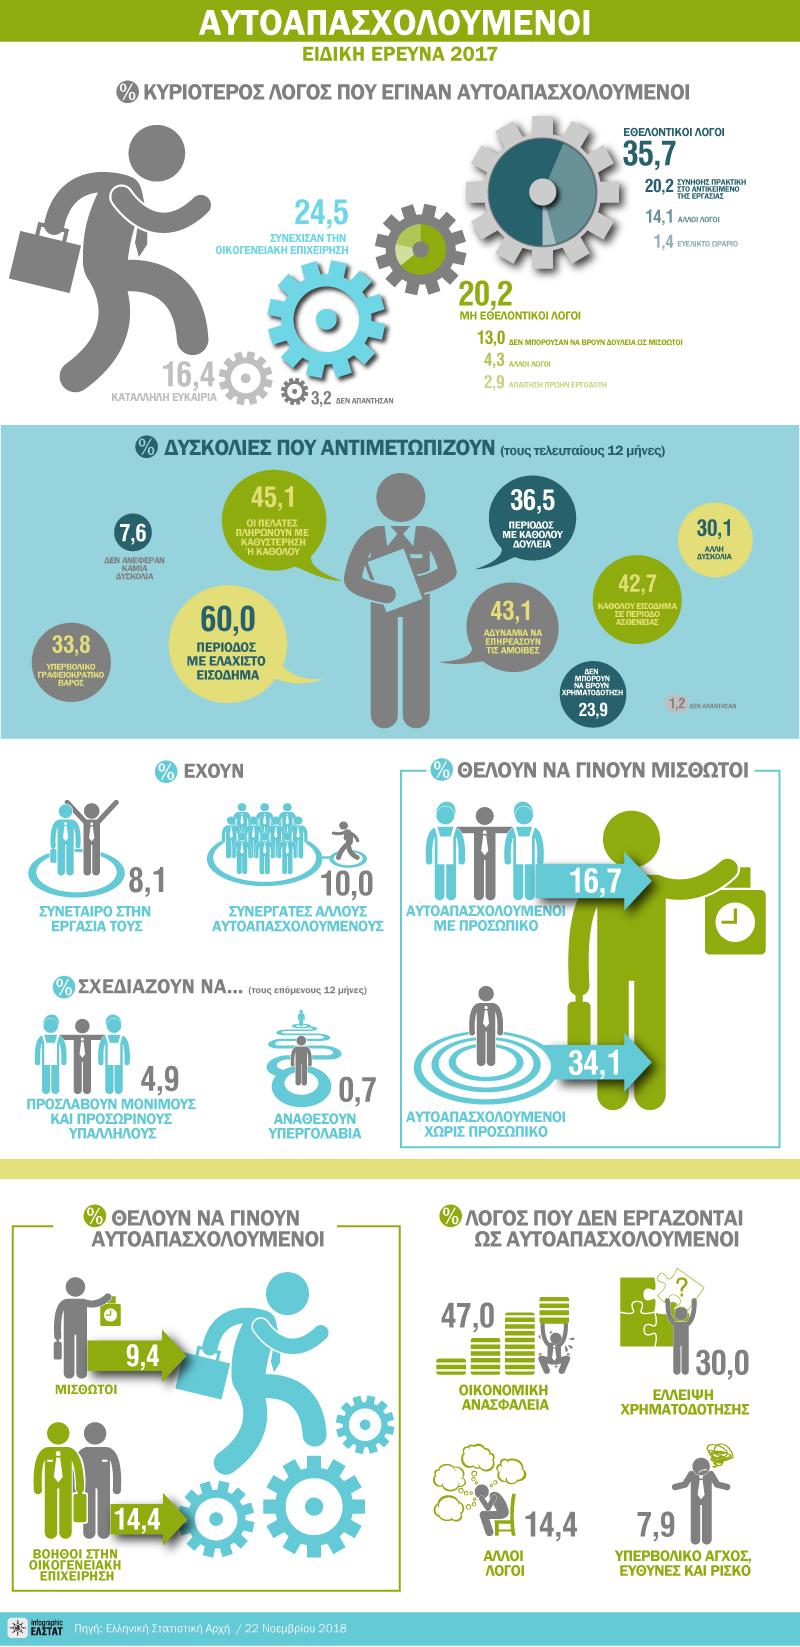 infographic-adhoc-aftoapasx-2017 gr